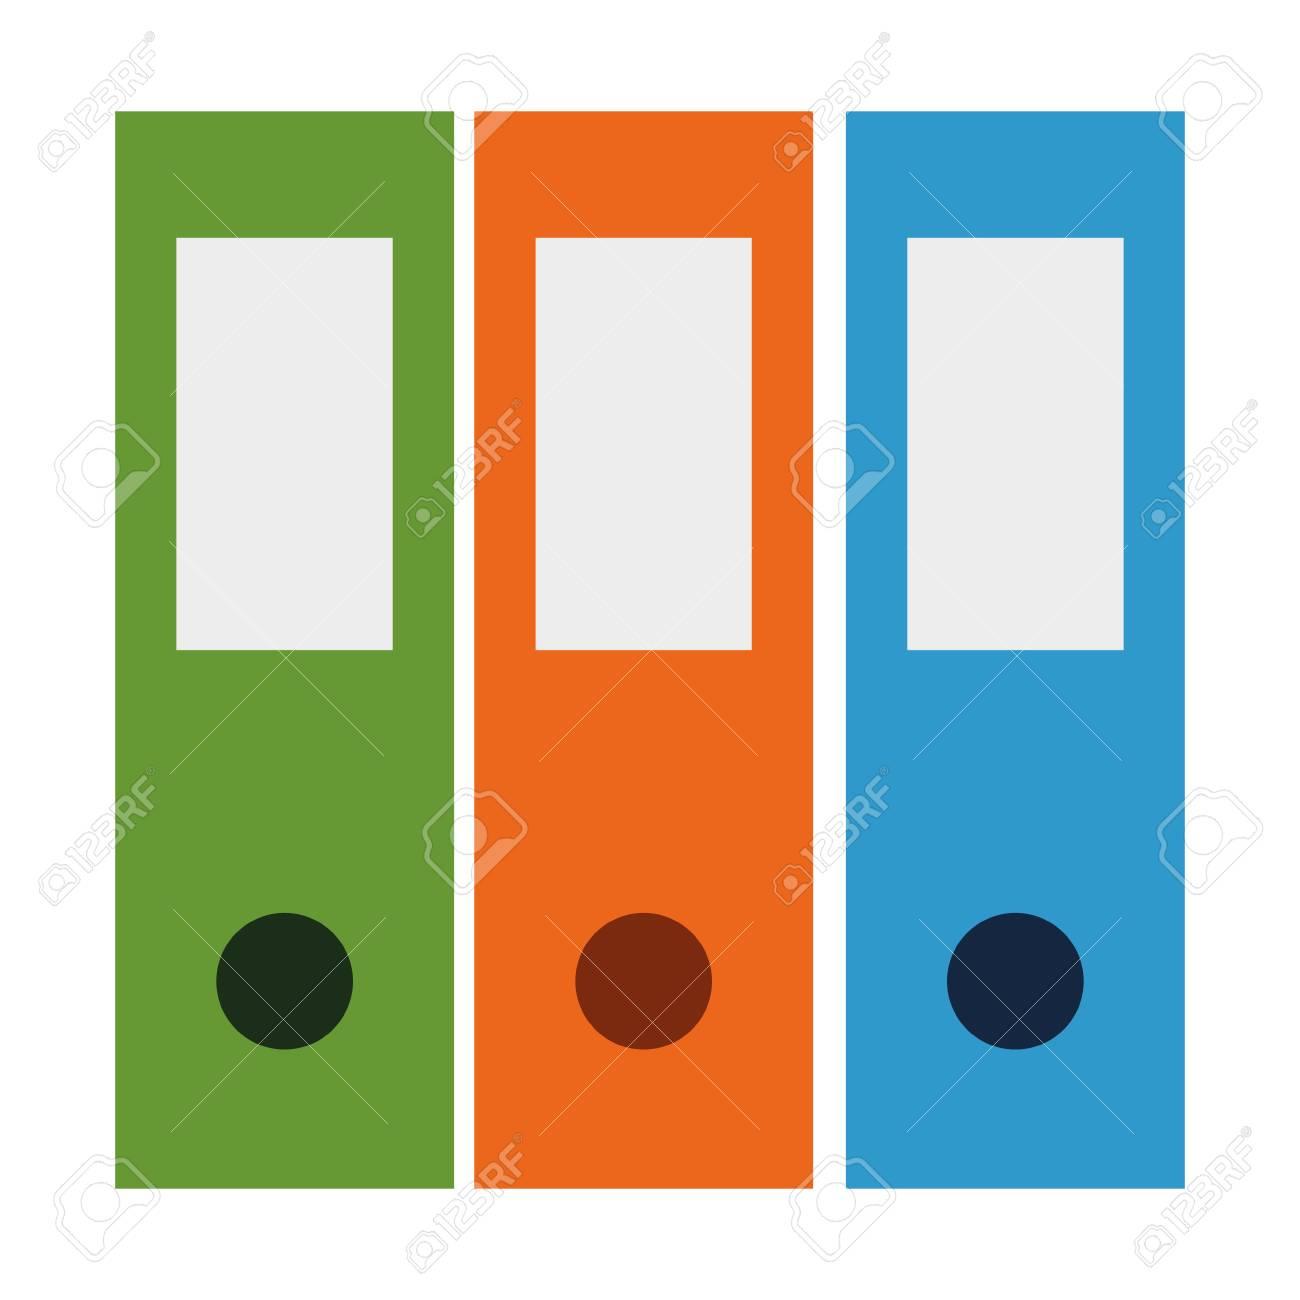 office files organiser icon vector illustration design - 114950970